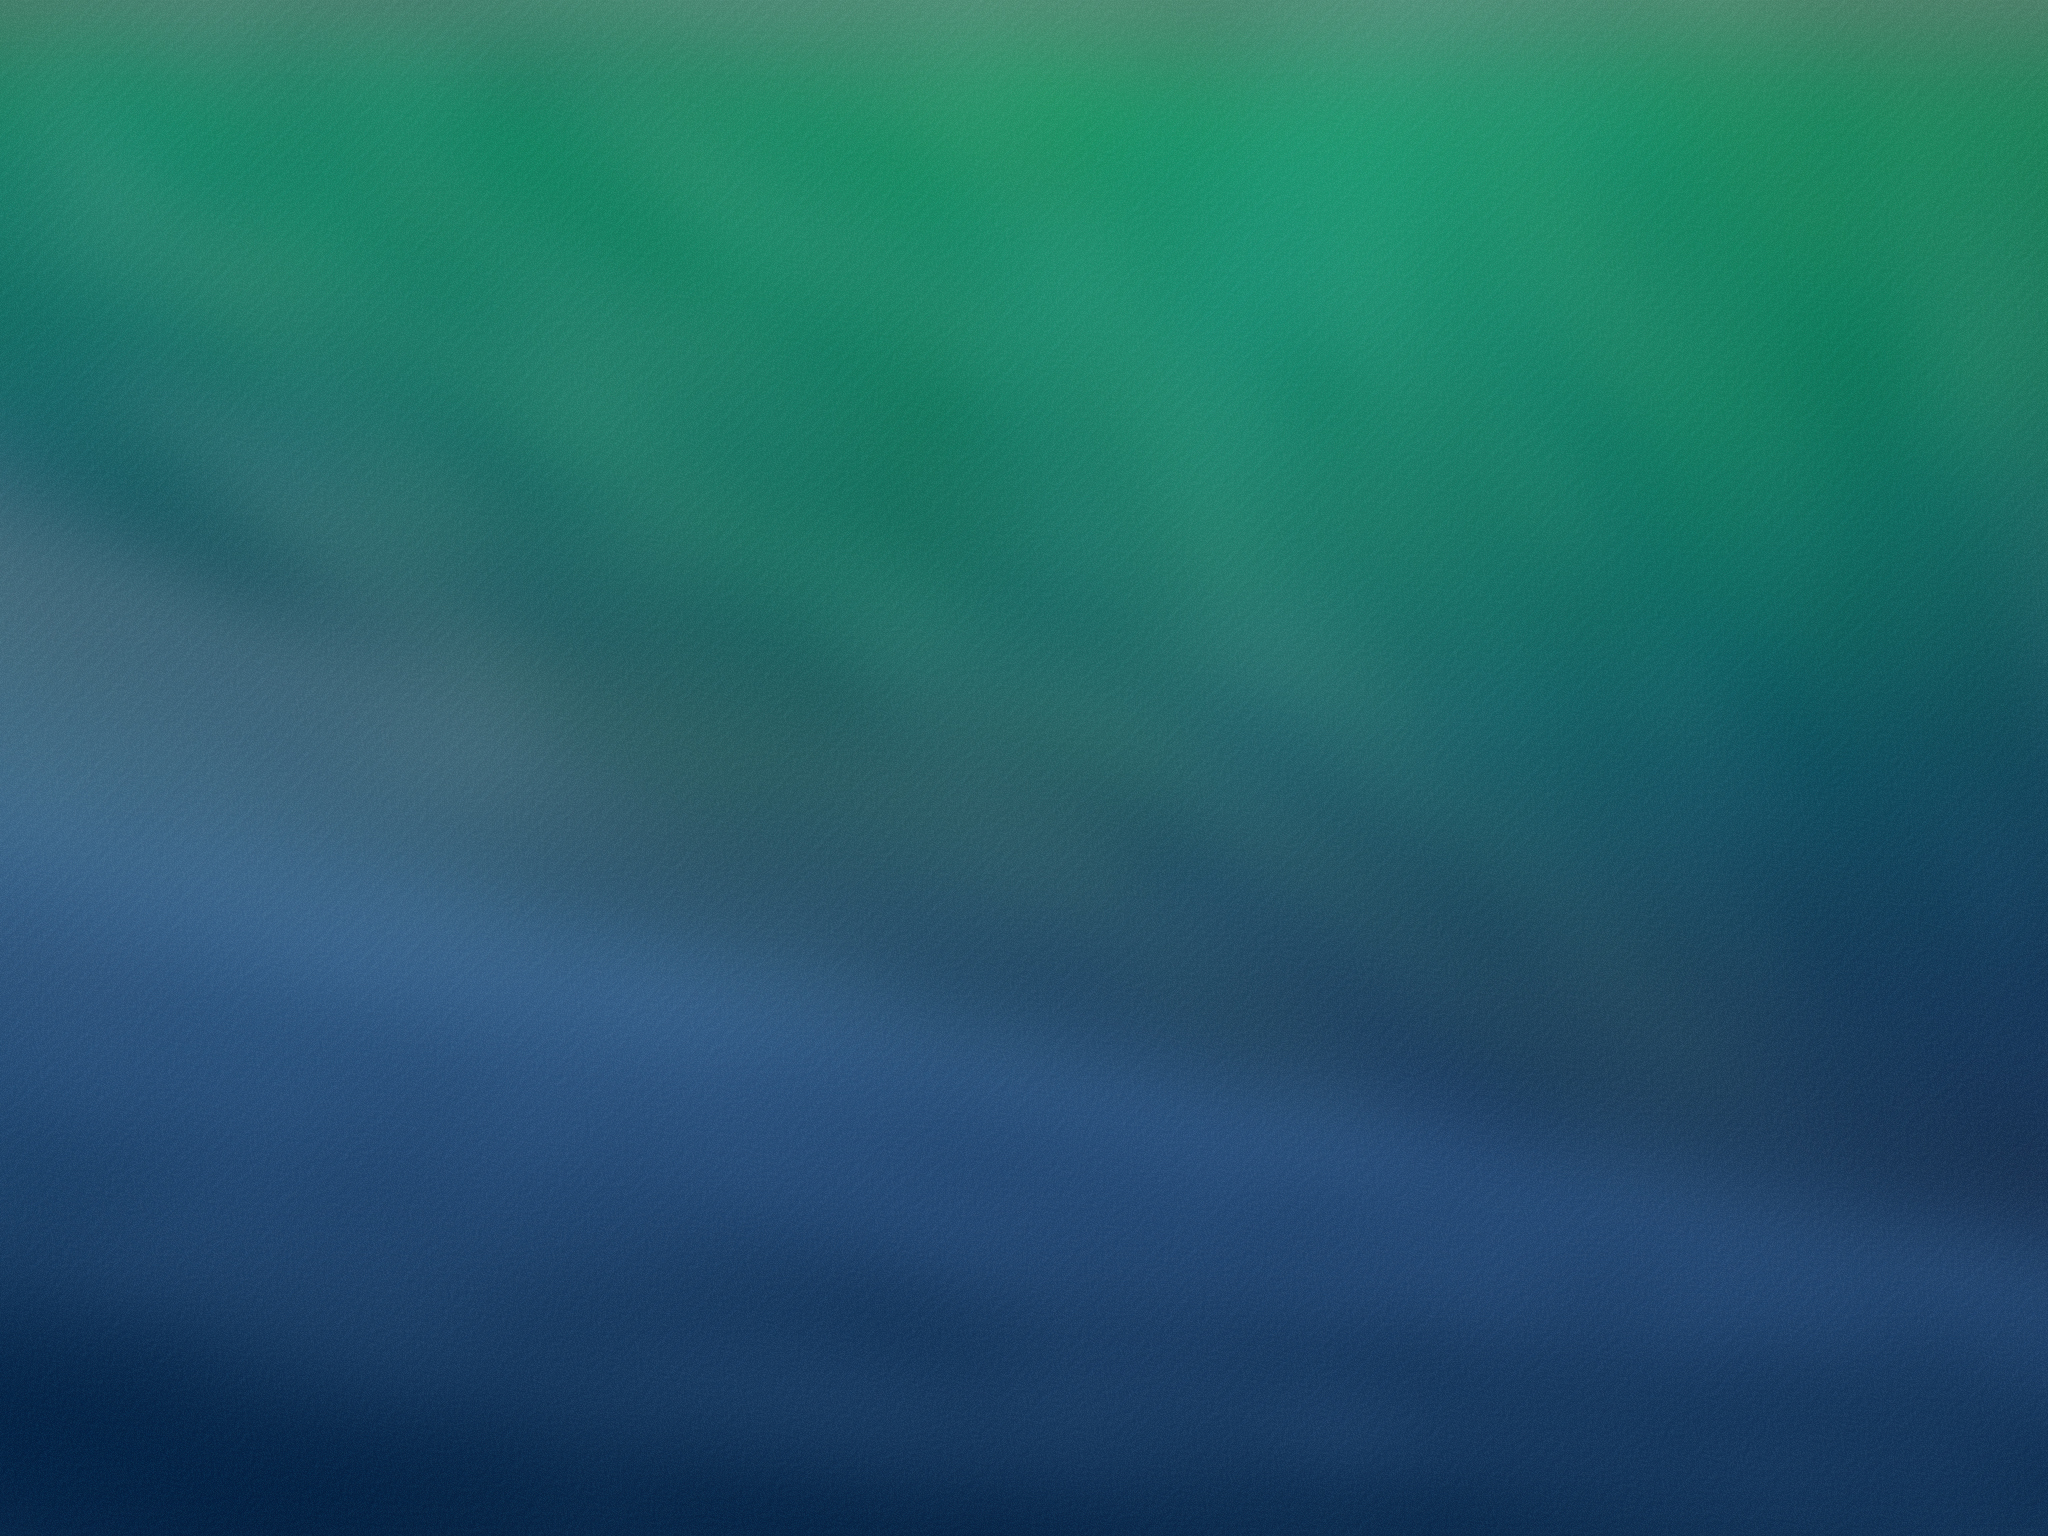 Cool Nature Wallpapers 3d Hd Wallpaper For Ipad Air Pixelstalk Net